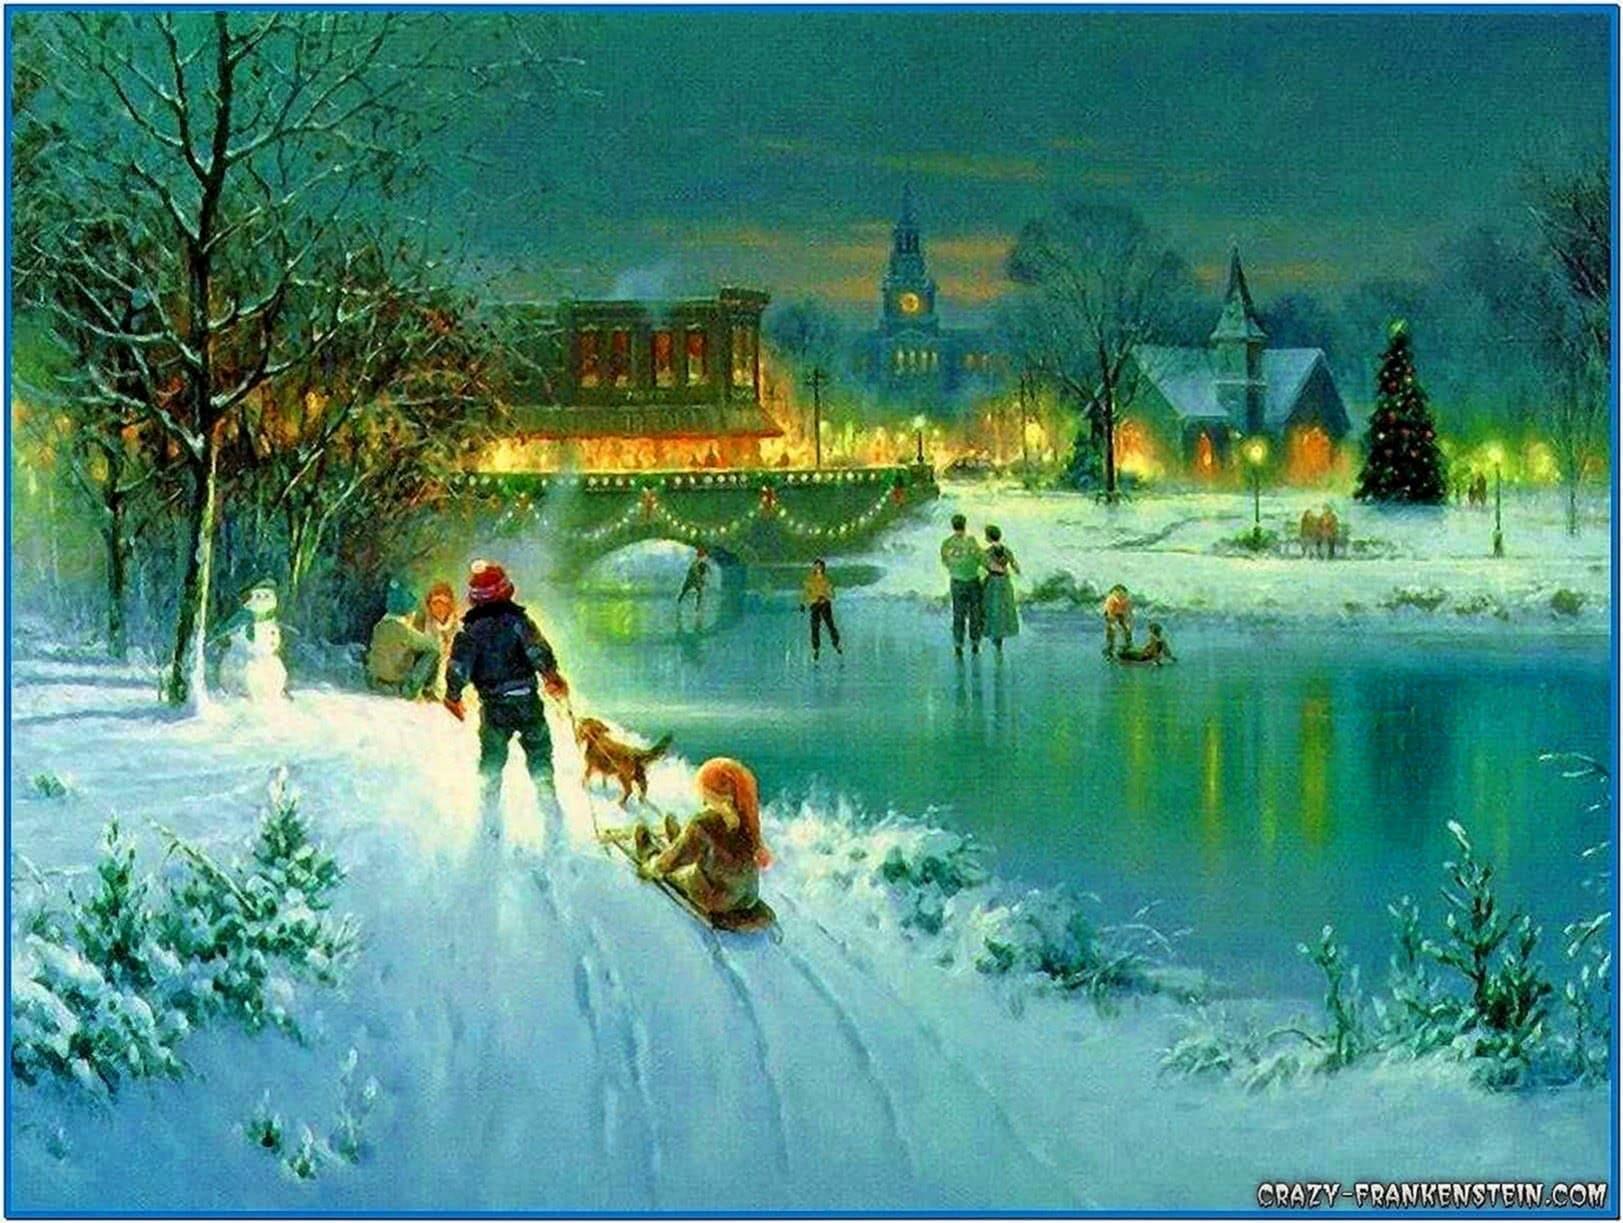 Christmas winter scenes screensavers - Download free